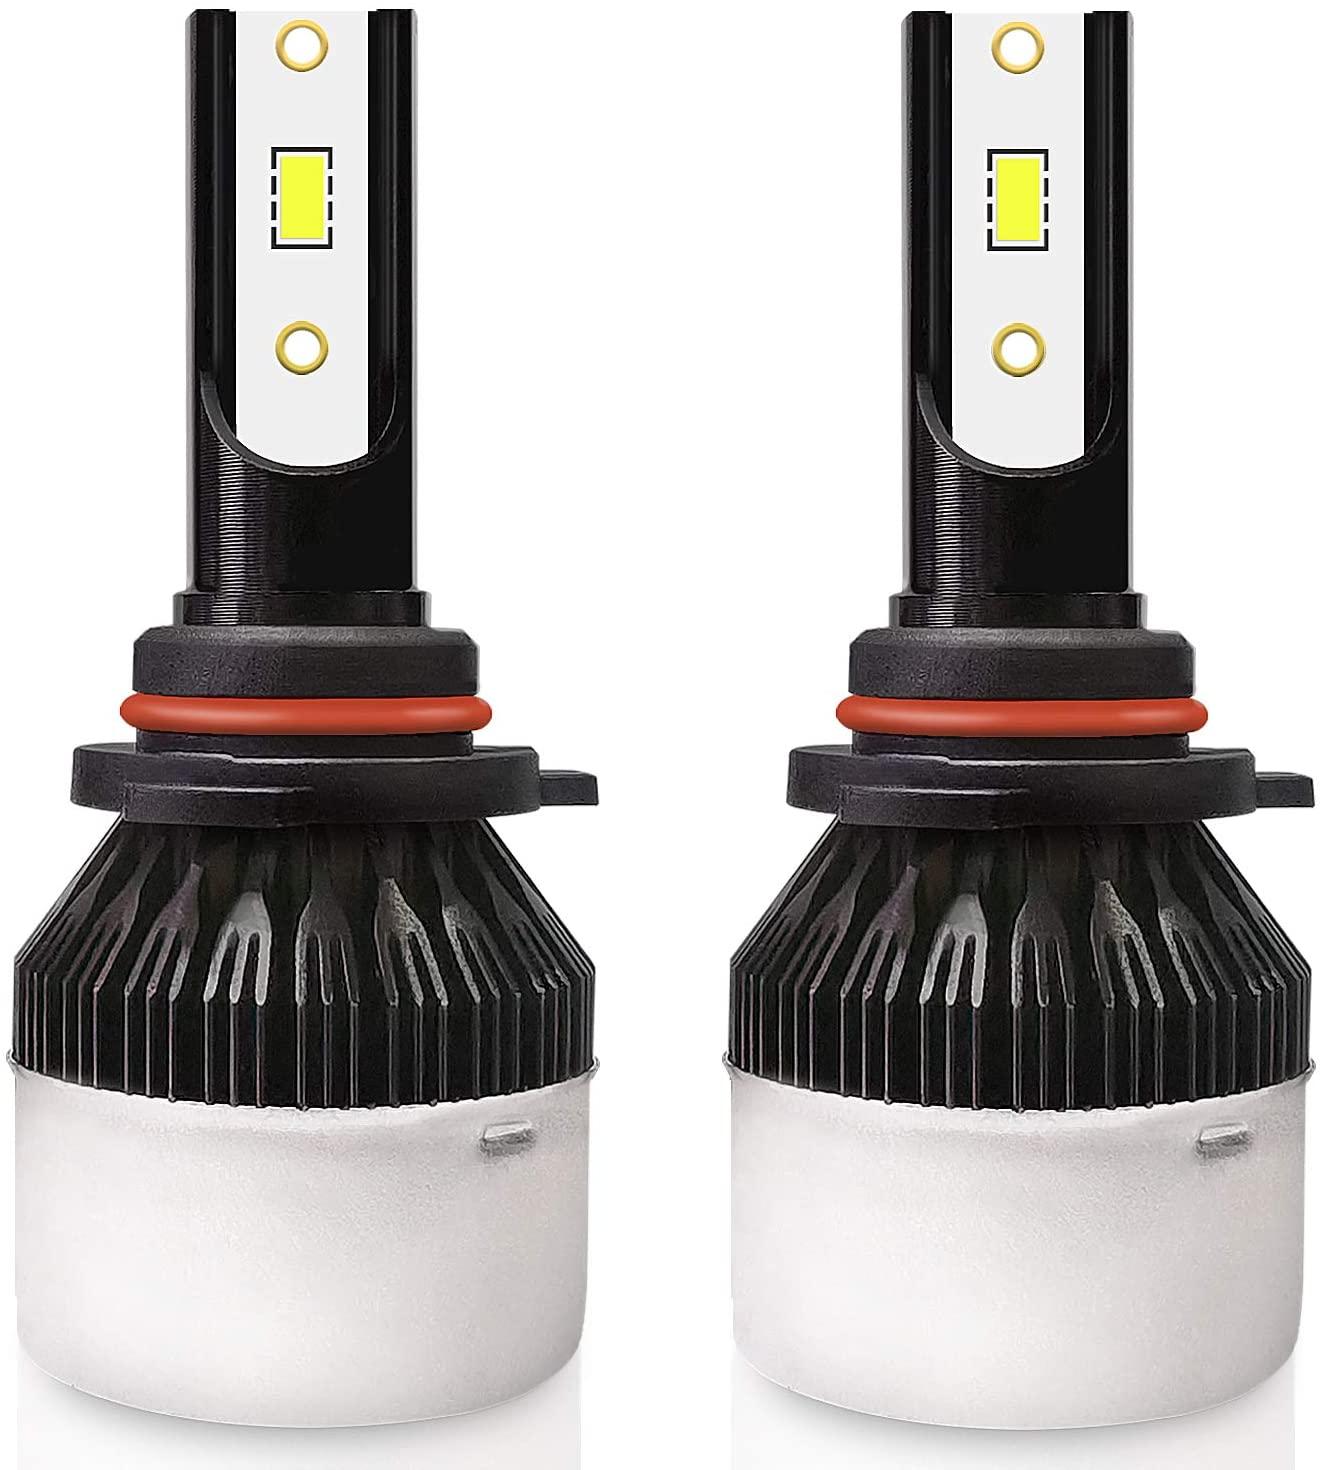 9005/9006/H1/H3/H4/H7/H11LED Headlight Blubs,24W 8000 Lumens Super Bright LED Headlights Conversion Kit 6000K Cool White IP65 Waterproof, Pack of 2 (H7)